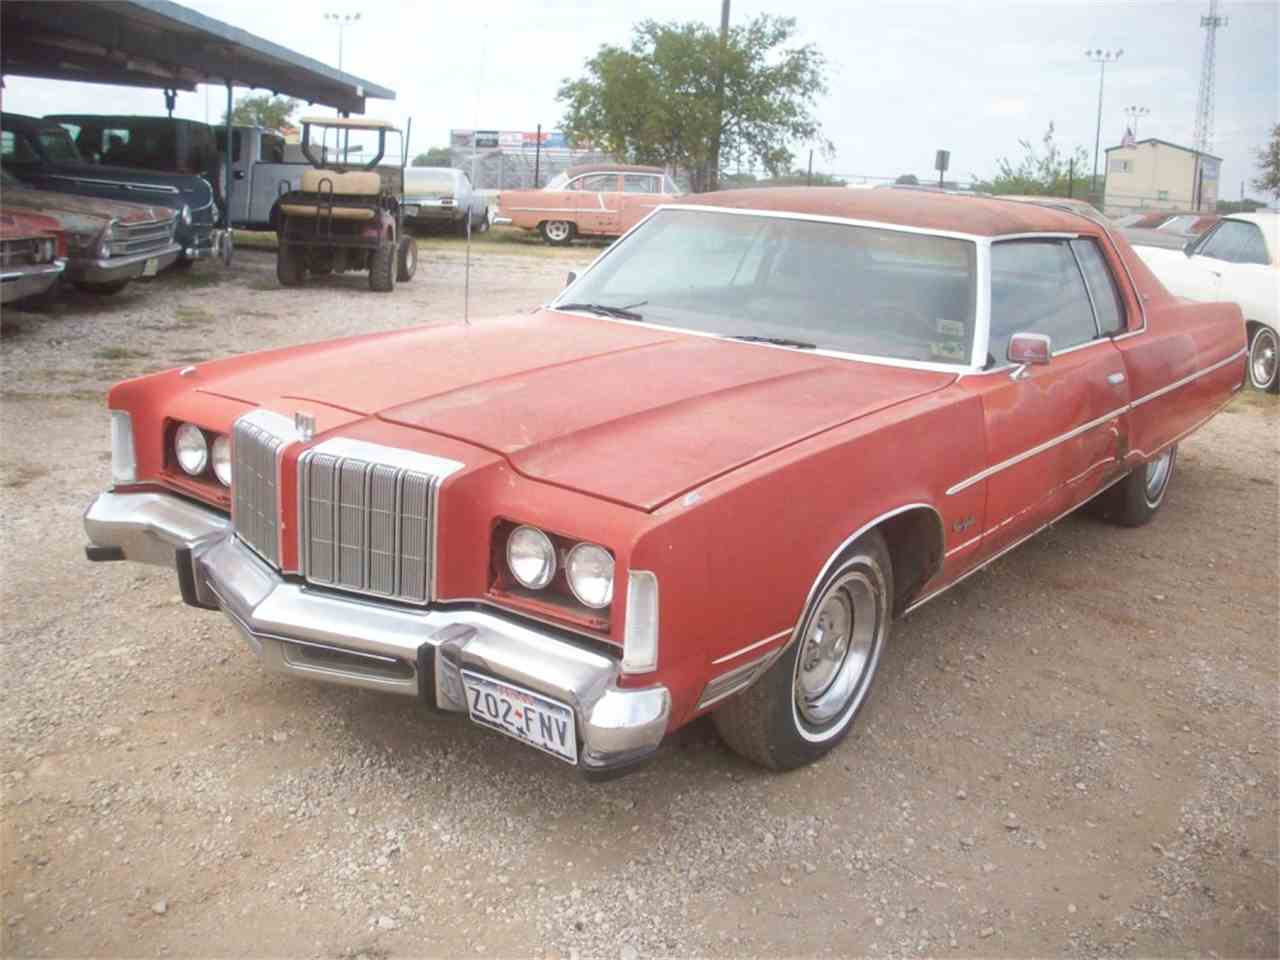 1978 Chrysler New Yorker for Sale - CC-889201